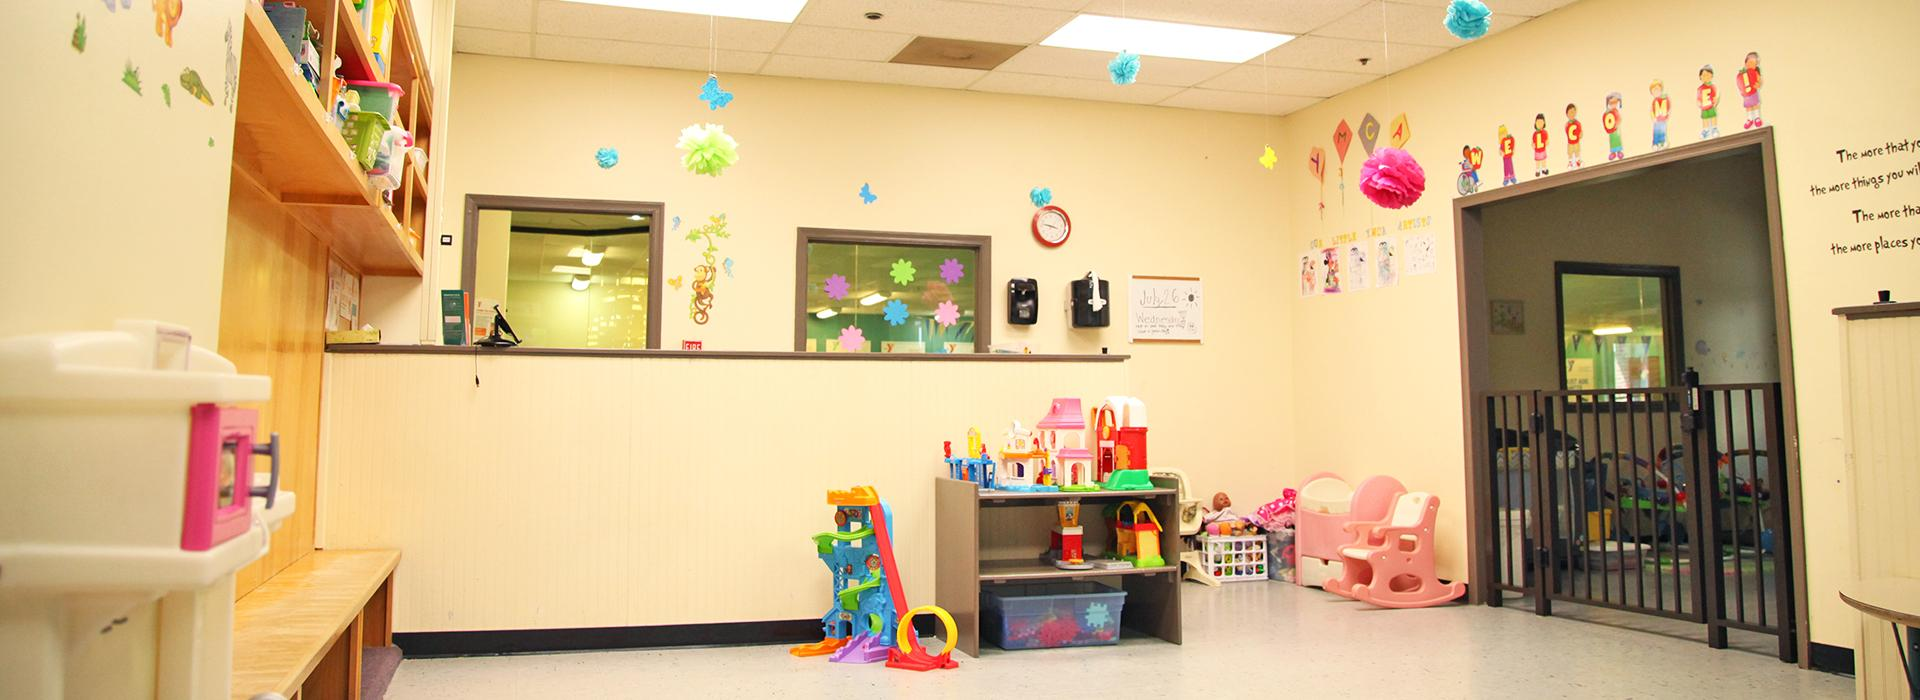 81 Interior Design Classes Hampton Roads Helping Homeless Children Succeed In School